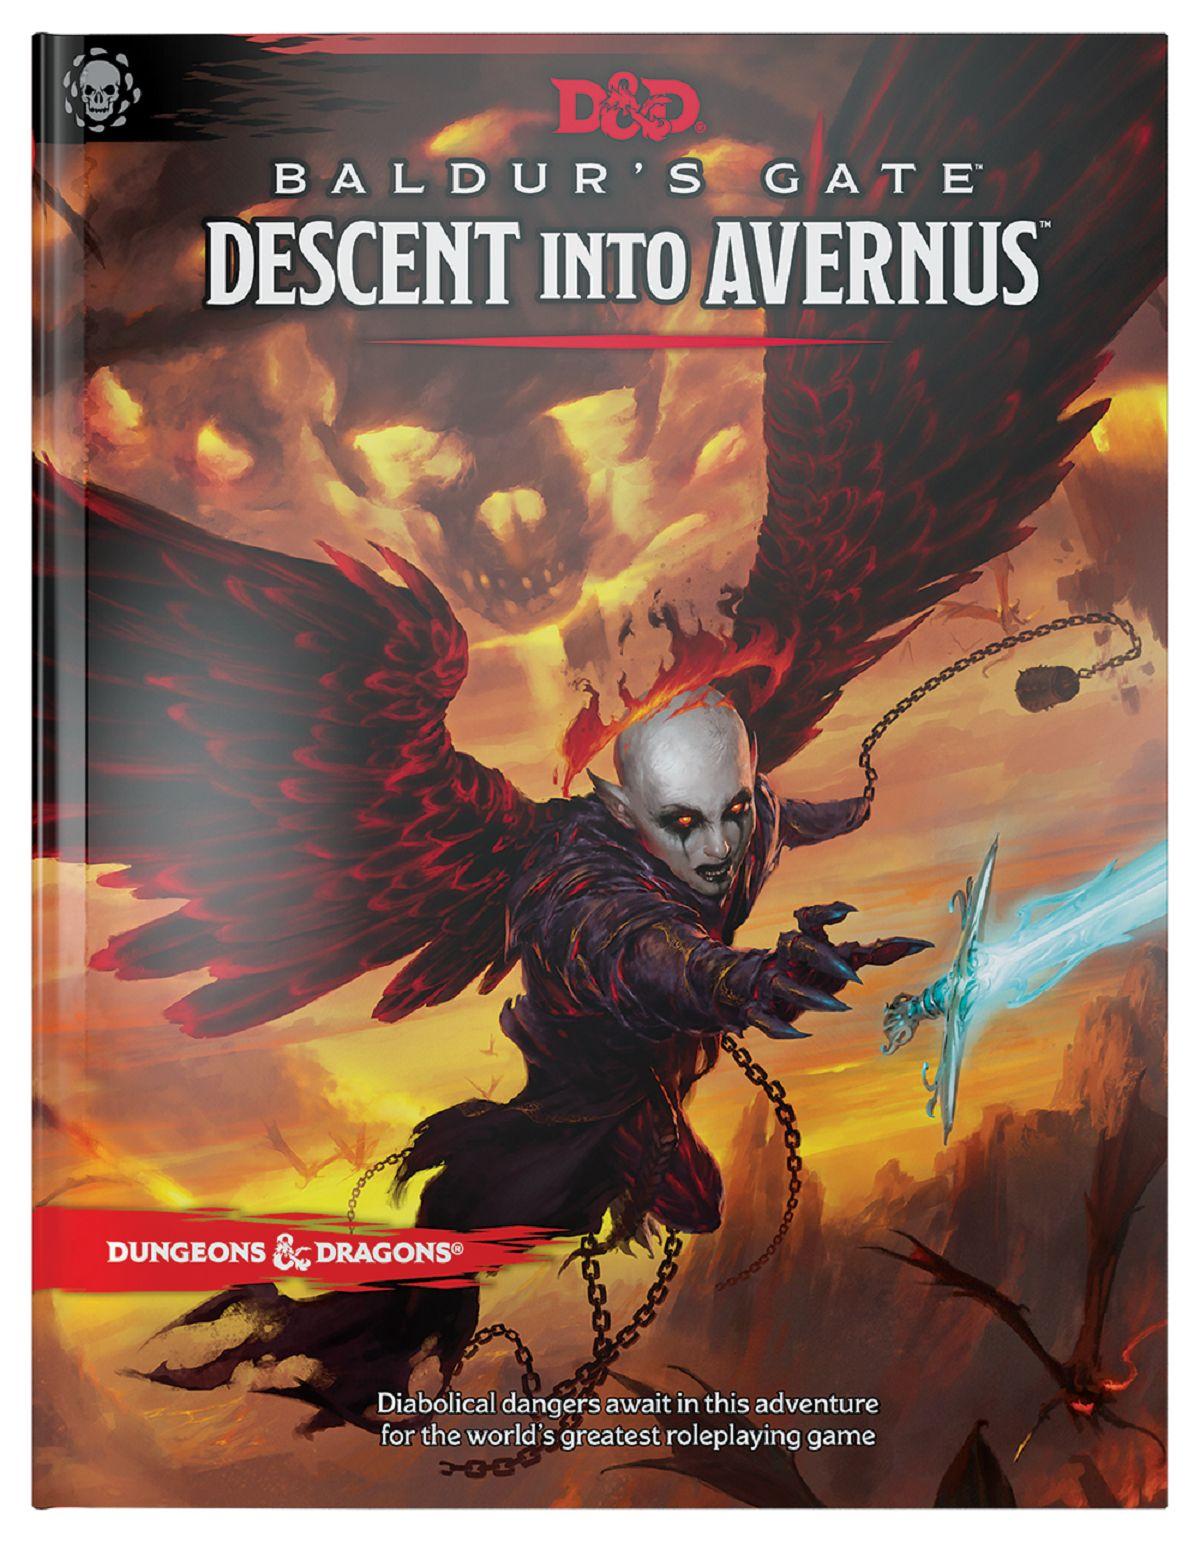 Review: Dungeons & Dragons – Baldur's Gate: Descent Into Avernus